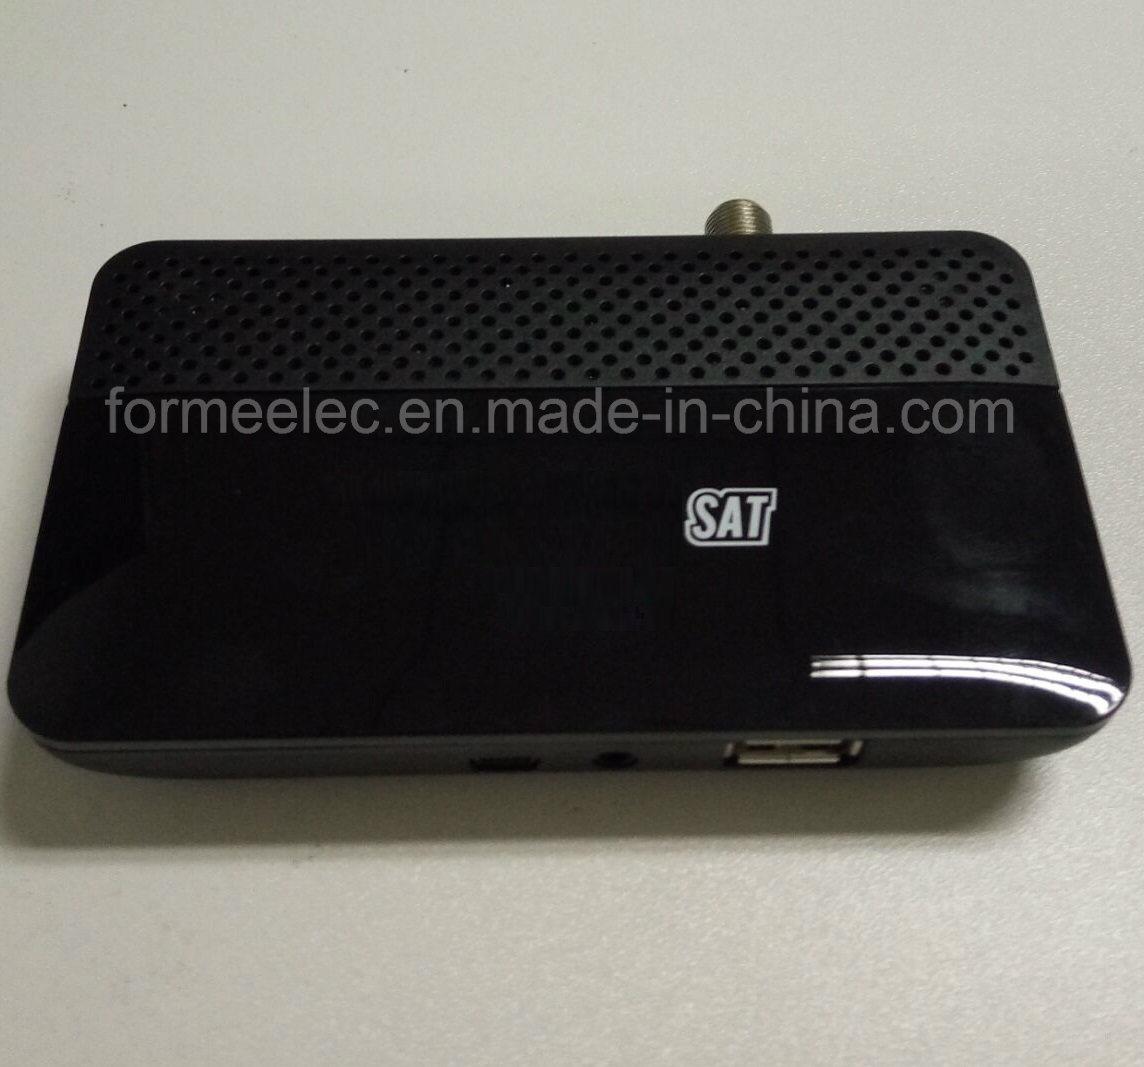 HD Mini DVB-S DVB-S2 Digital Satellite Receiver Set Top Box